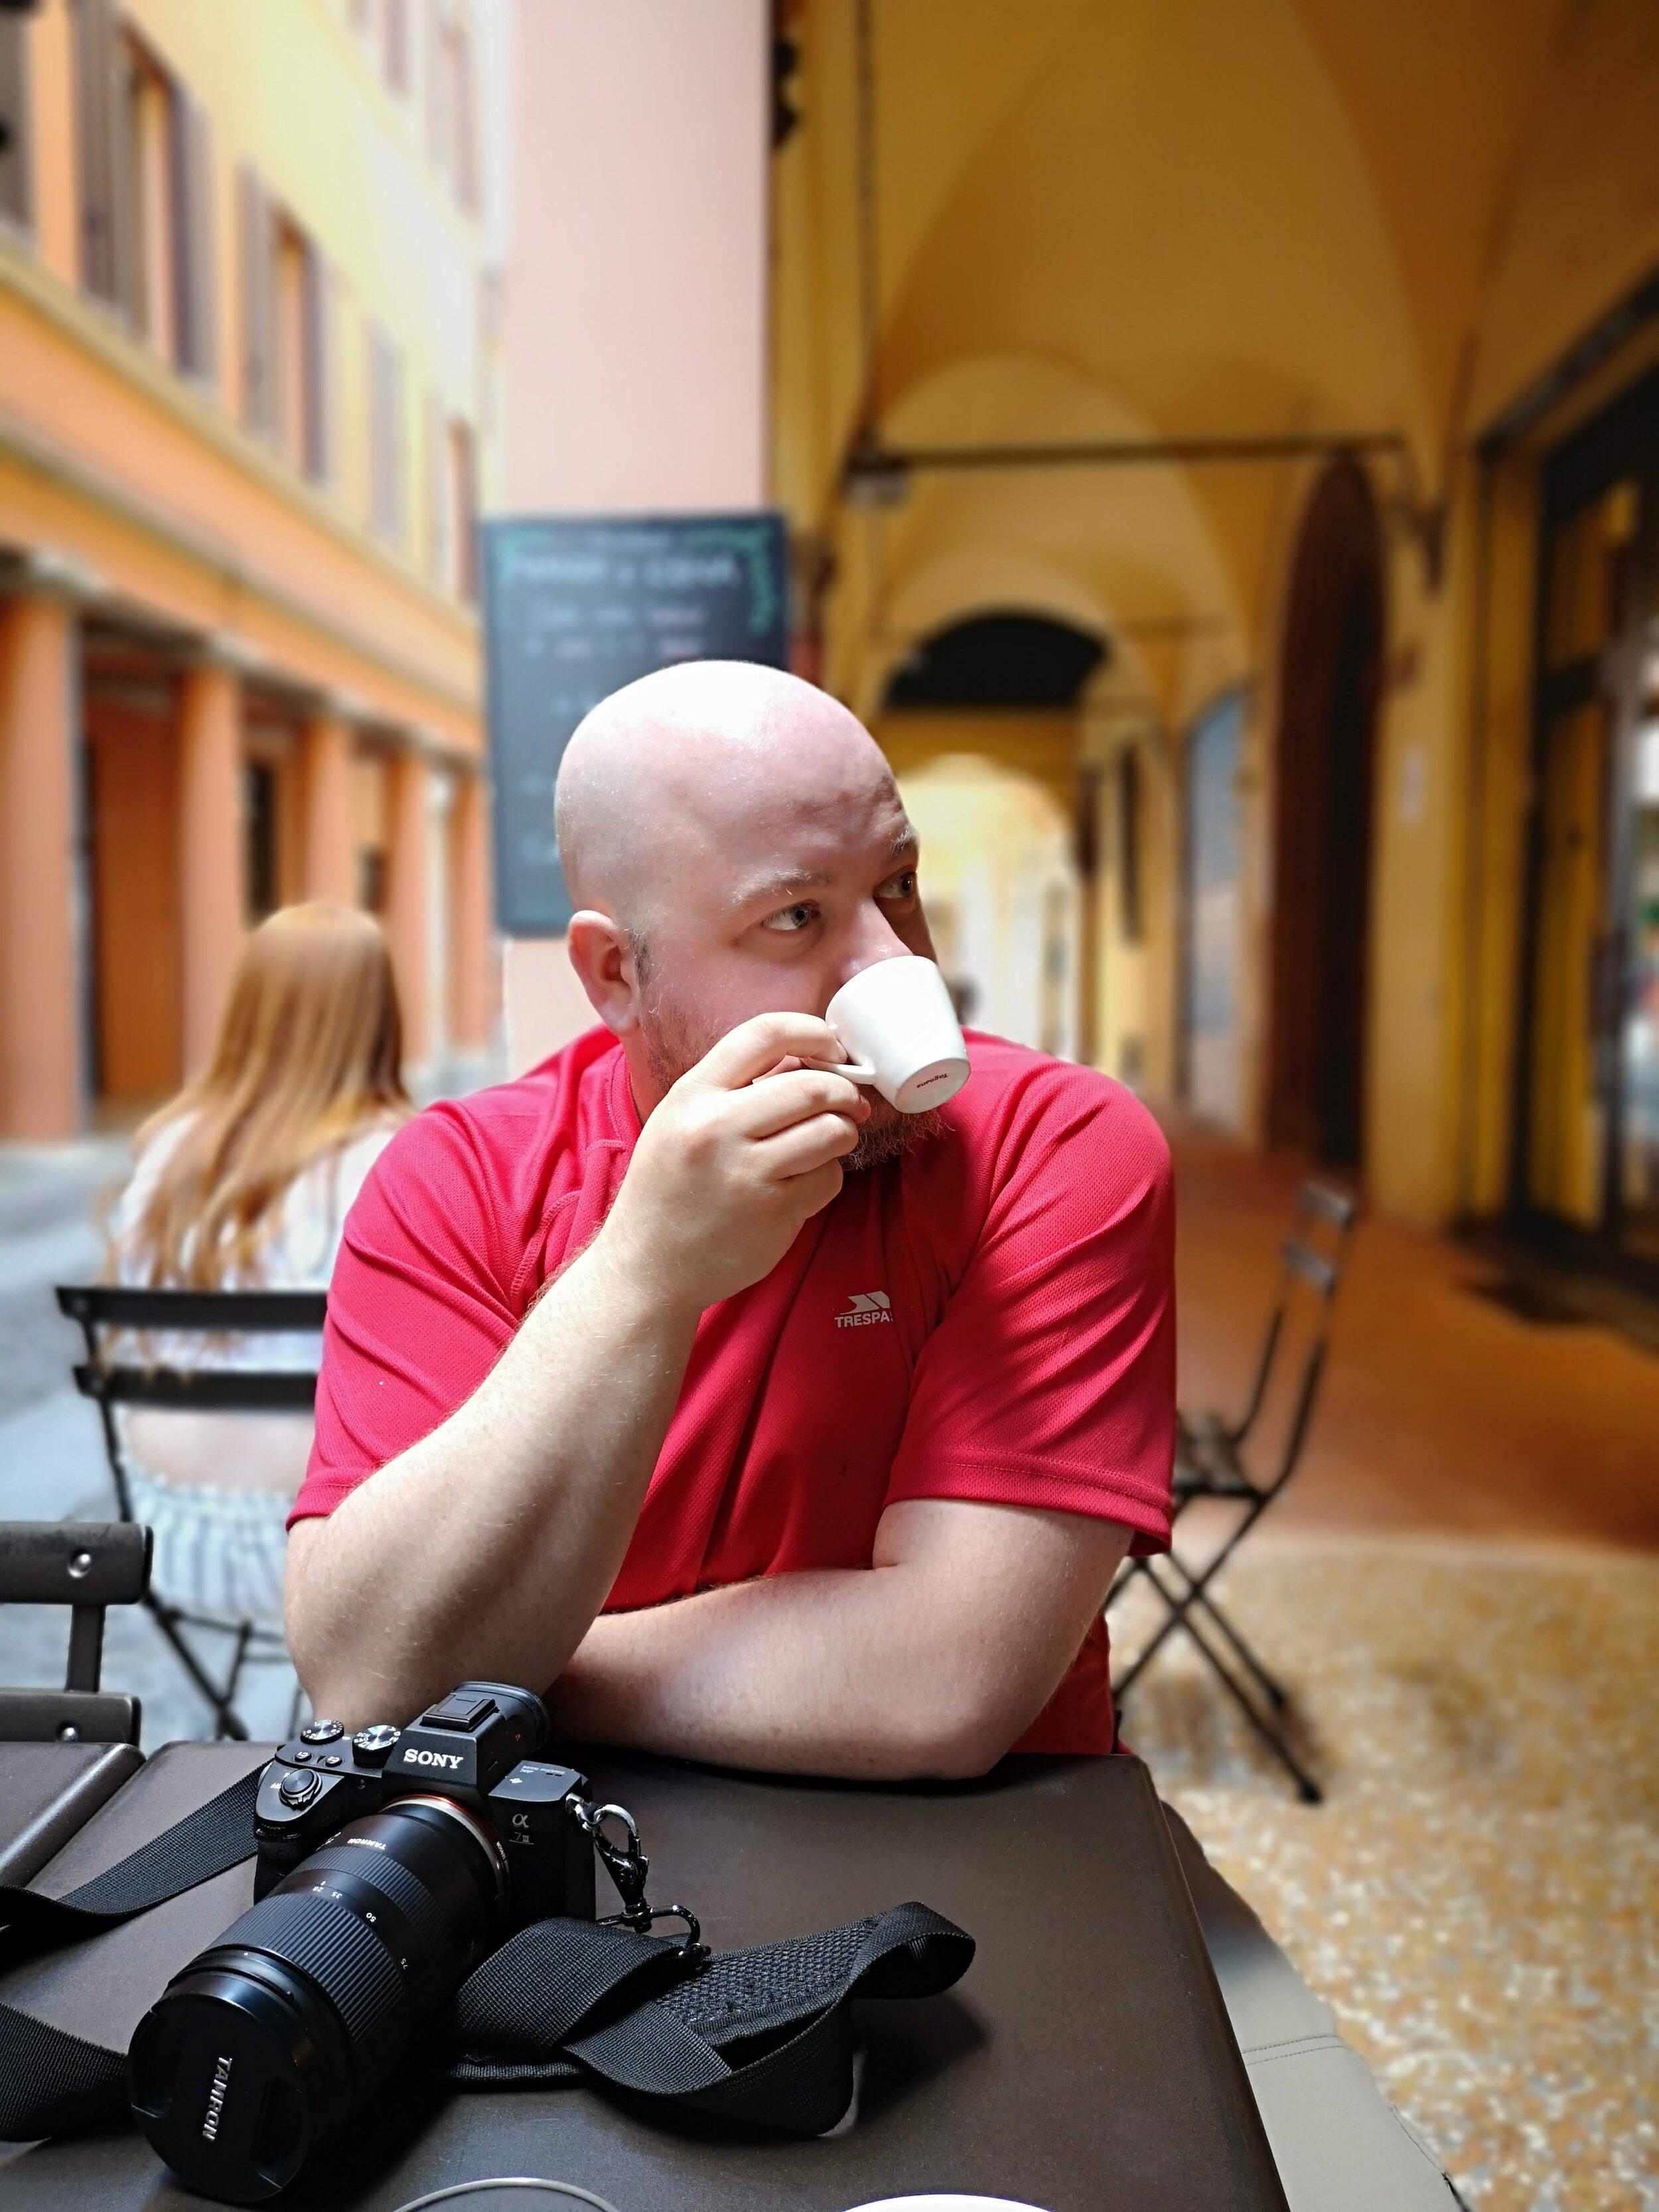 photographier enjoying coffee.jpg